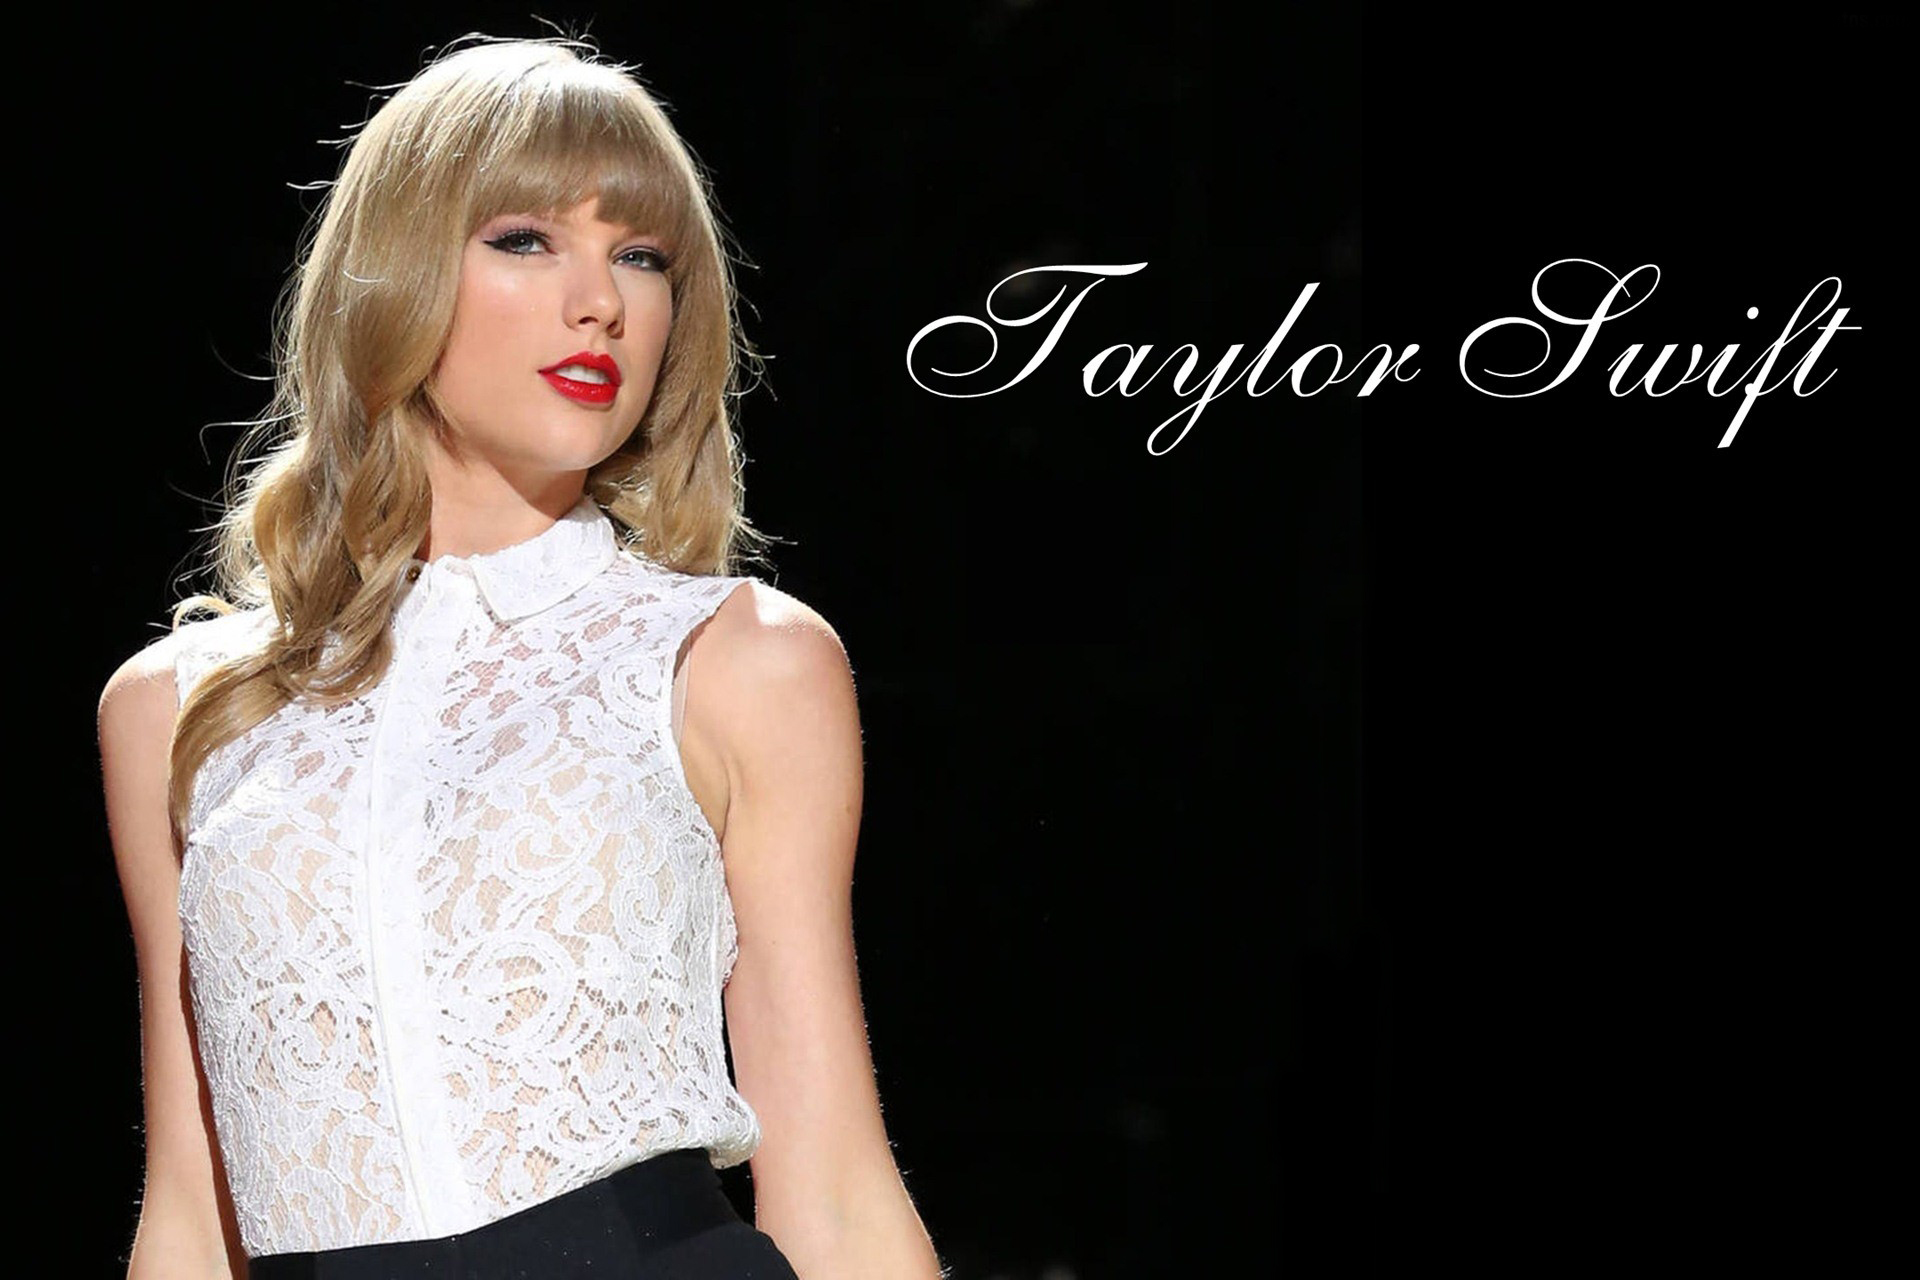 Taylor Swift 2015 Wallpaper For Desktop 1920x1280